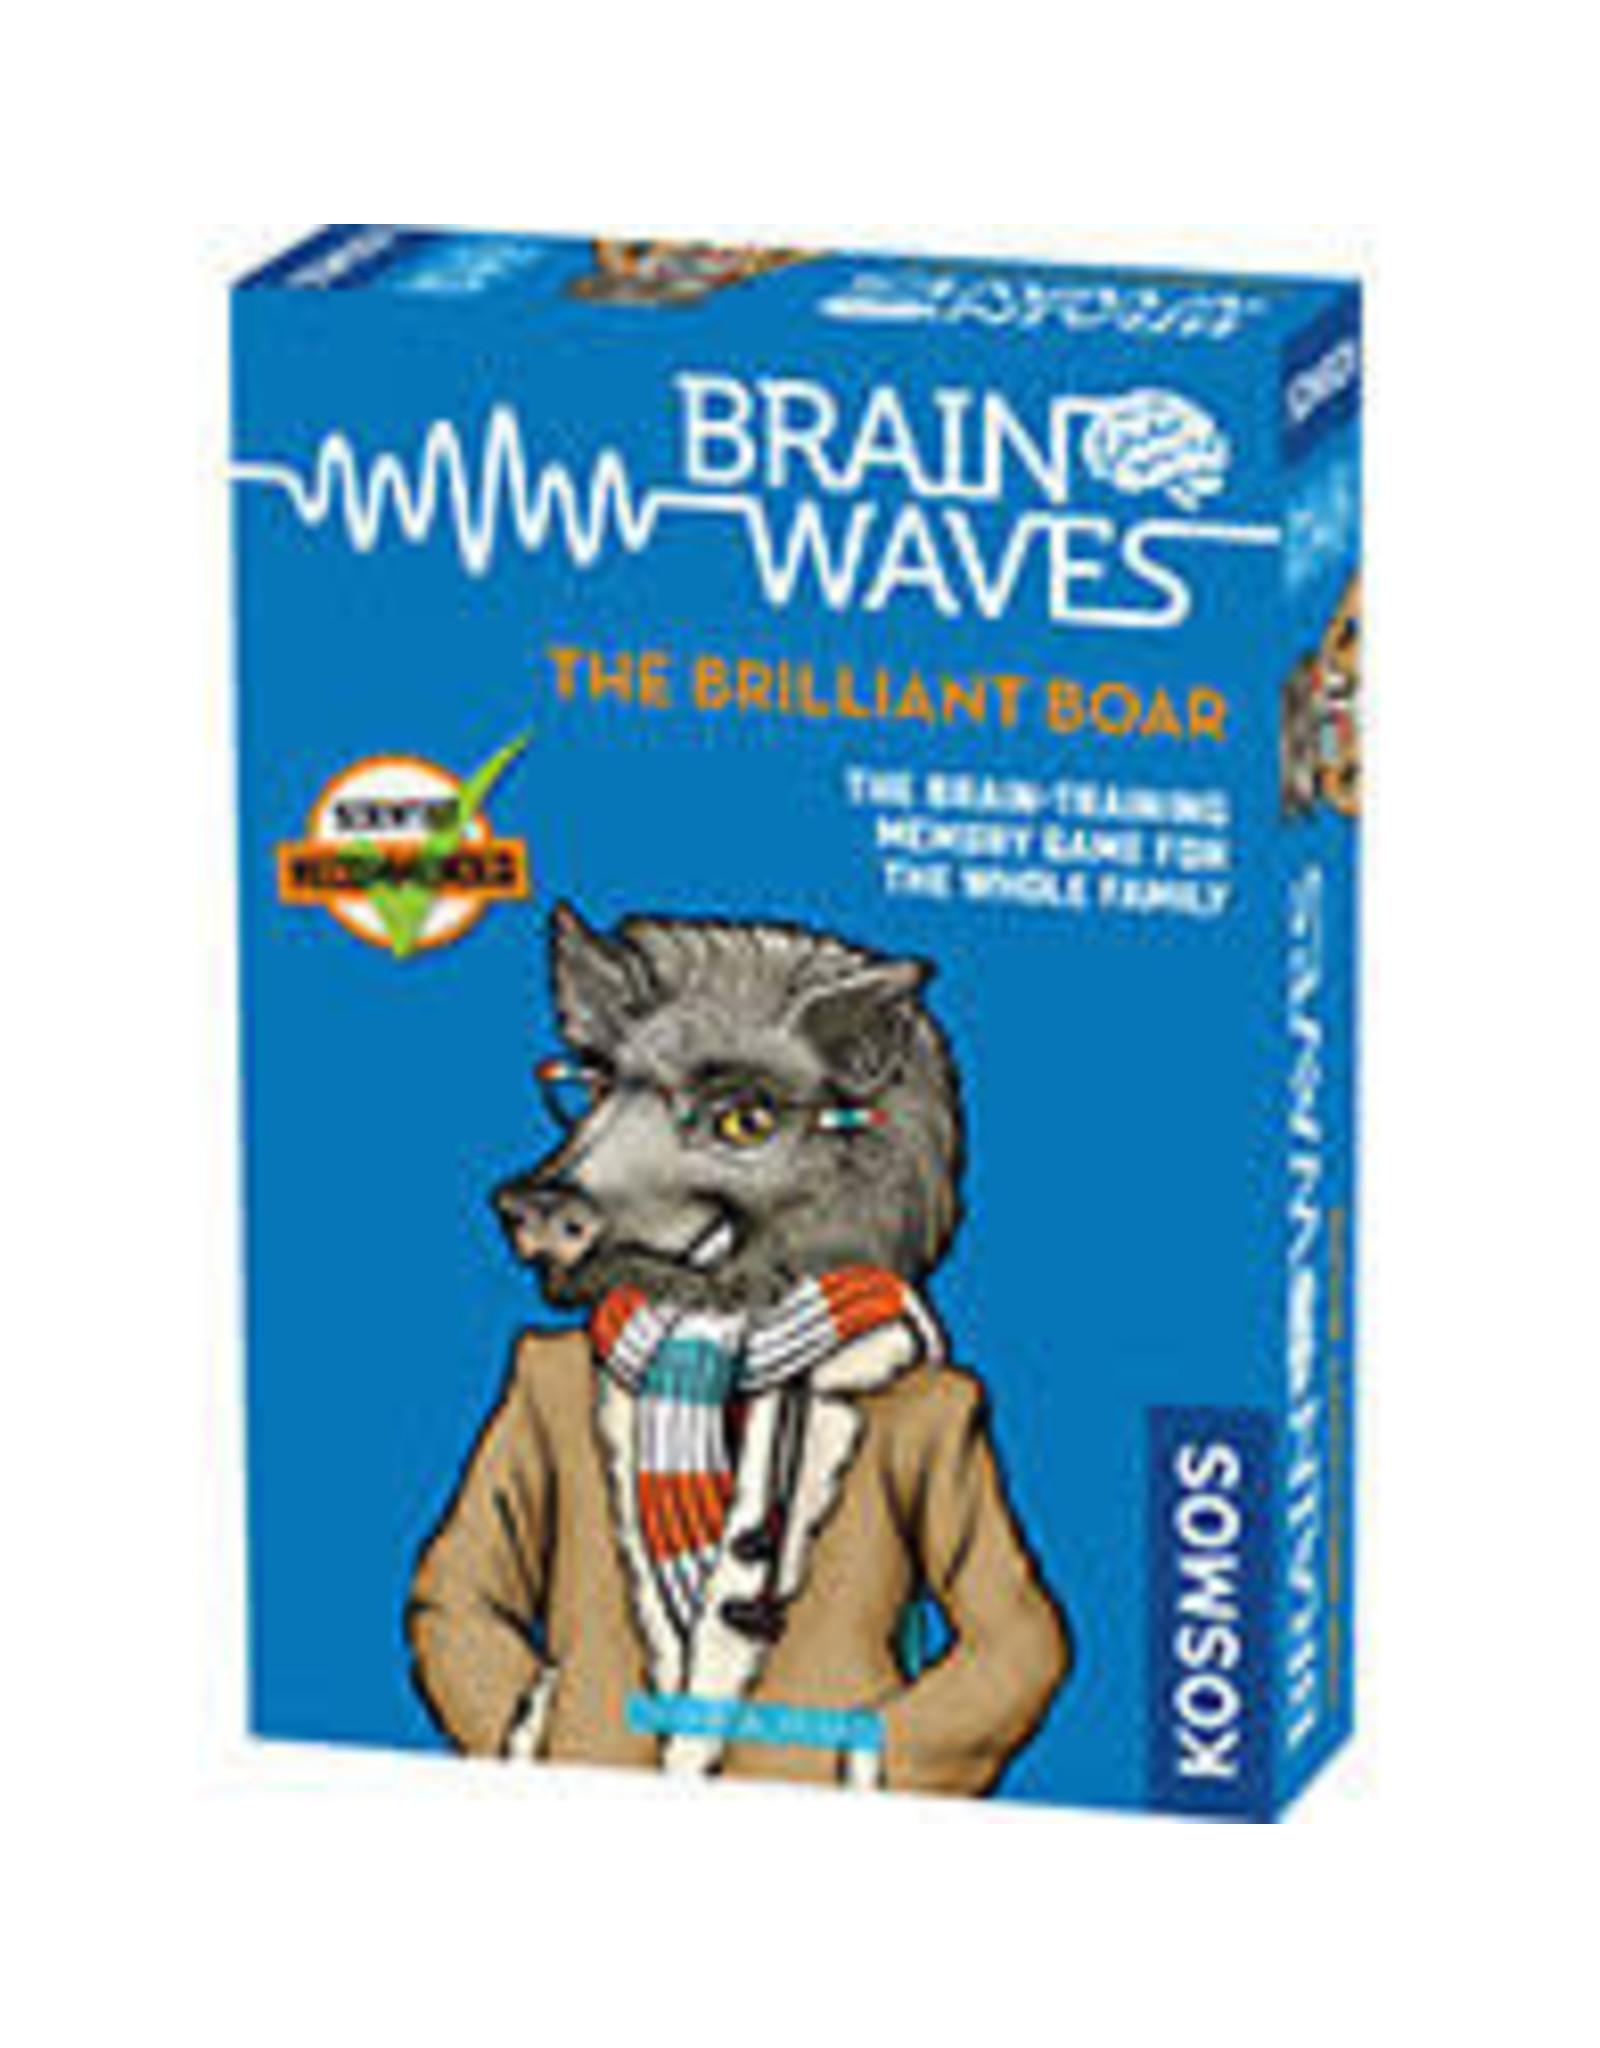 THAMES & KOSMOS Brainwaves: The Brilliant Boar